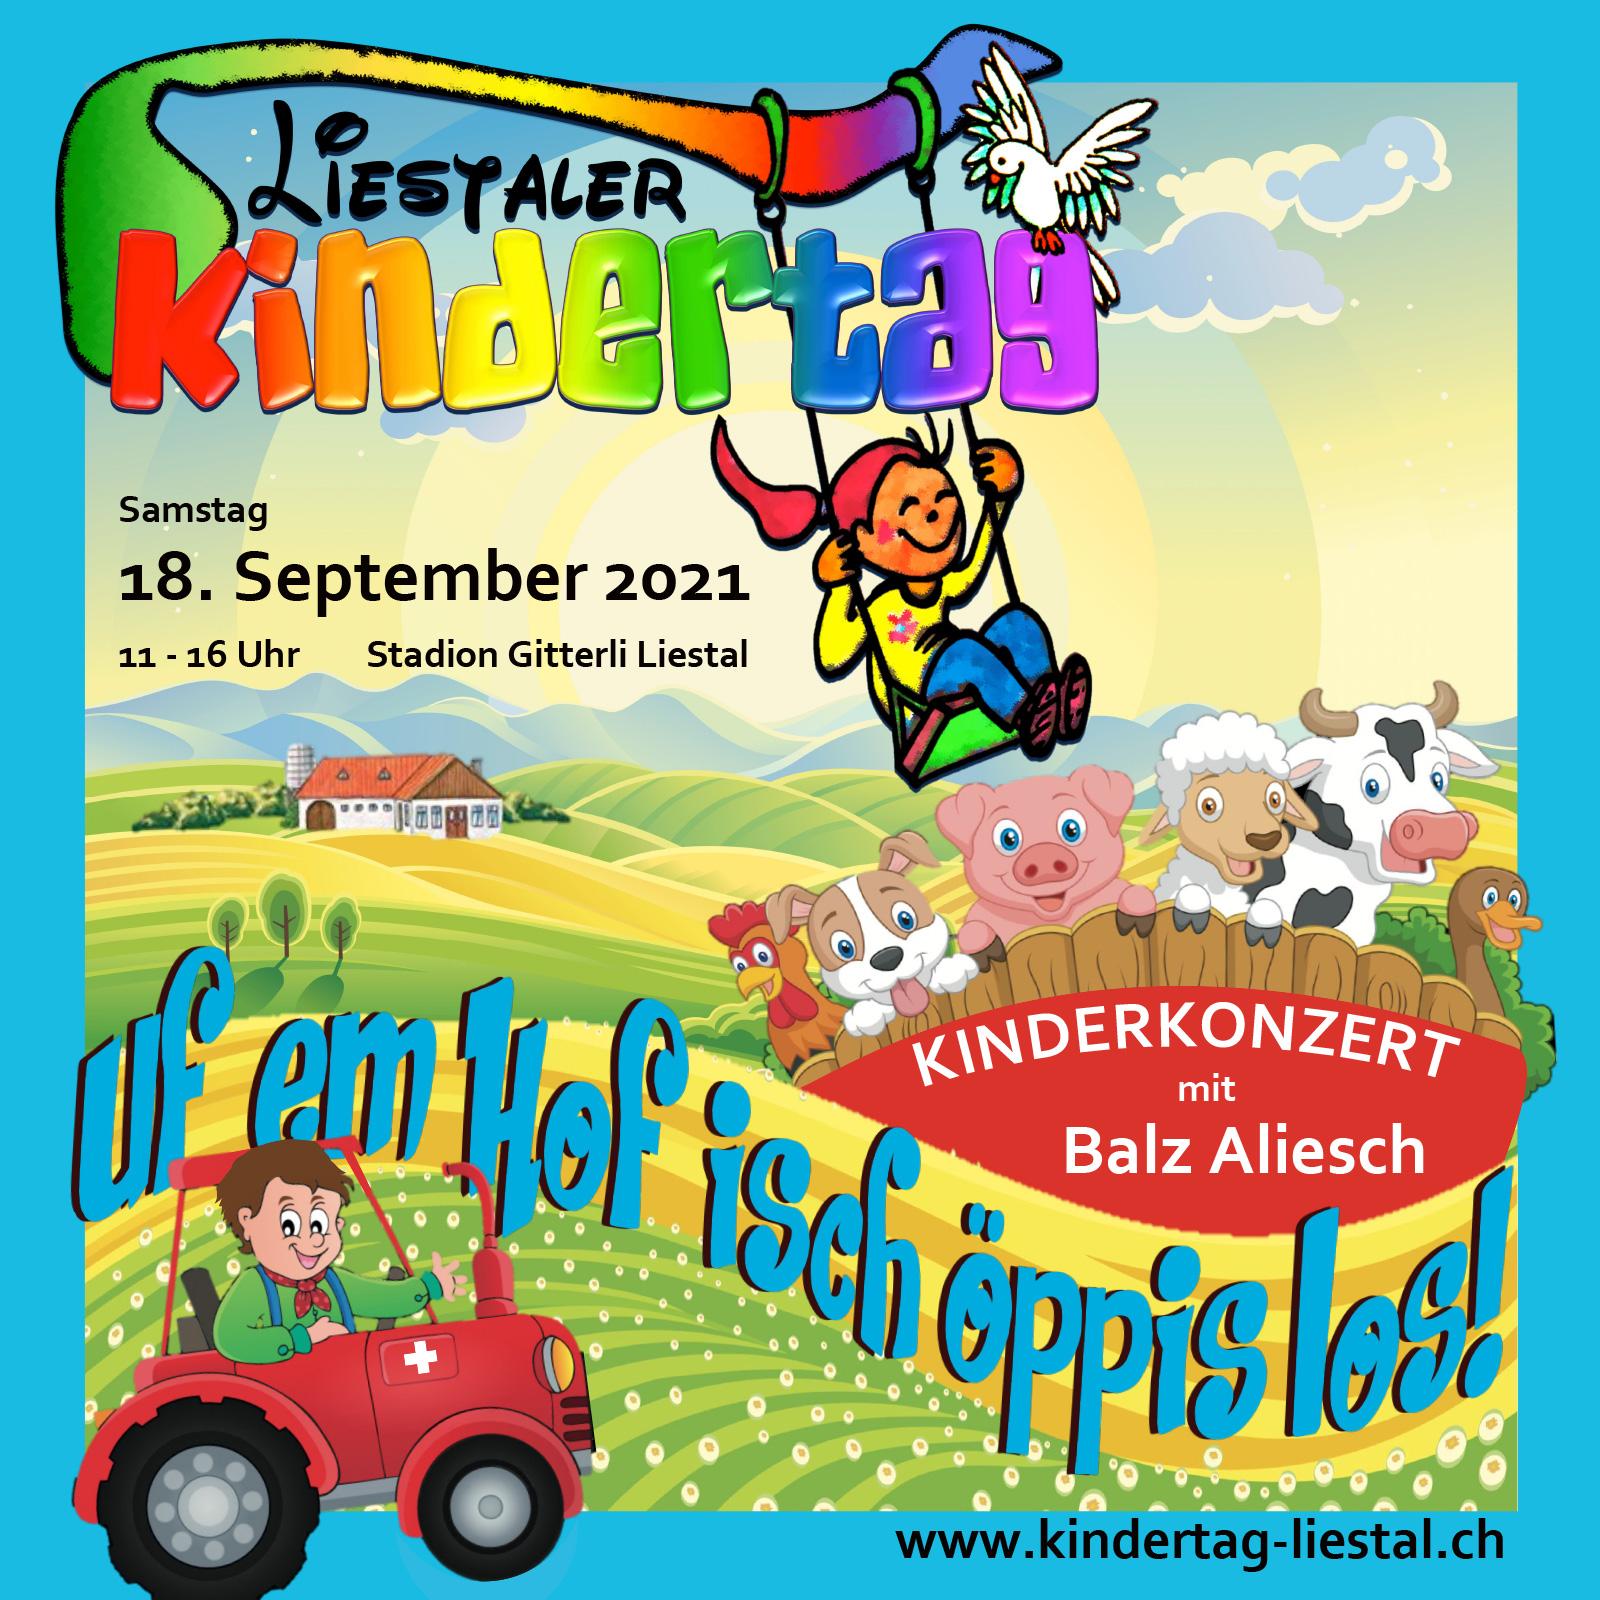 Kindertag Liestal 2021